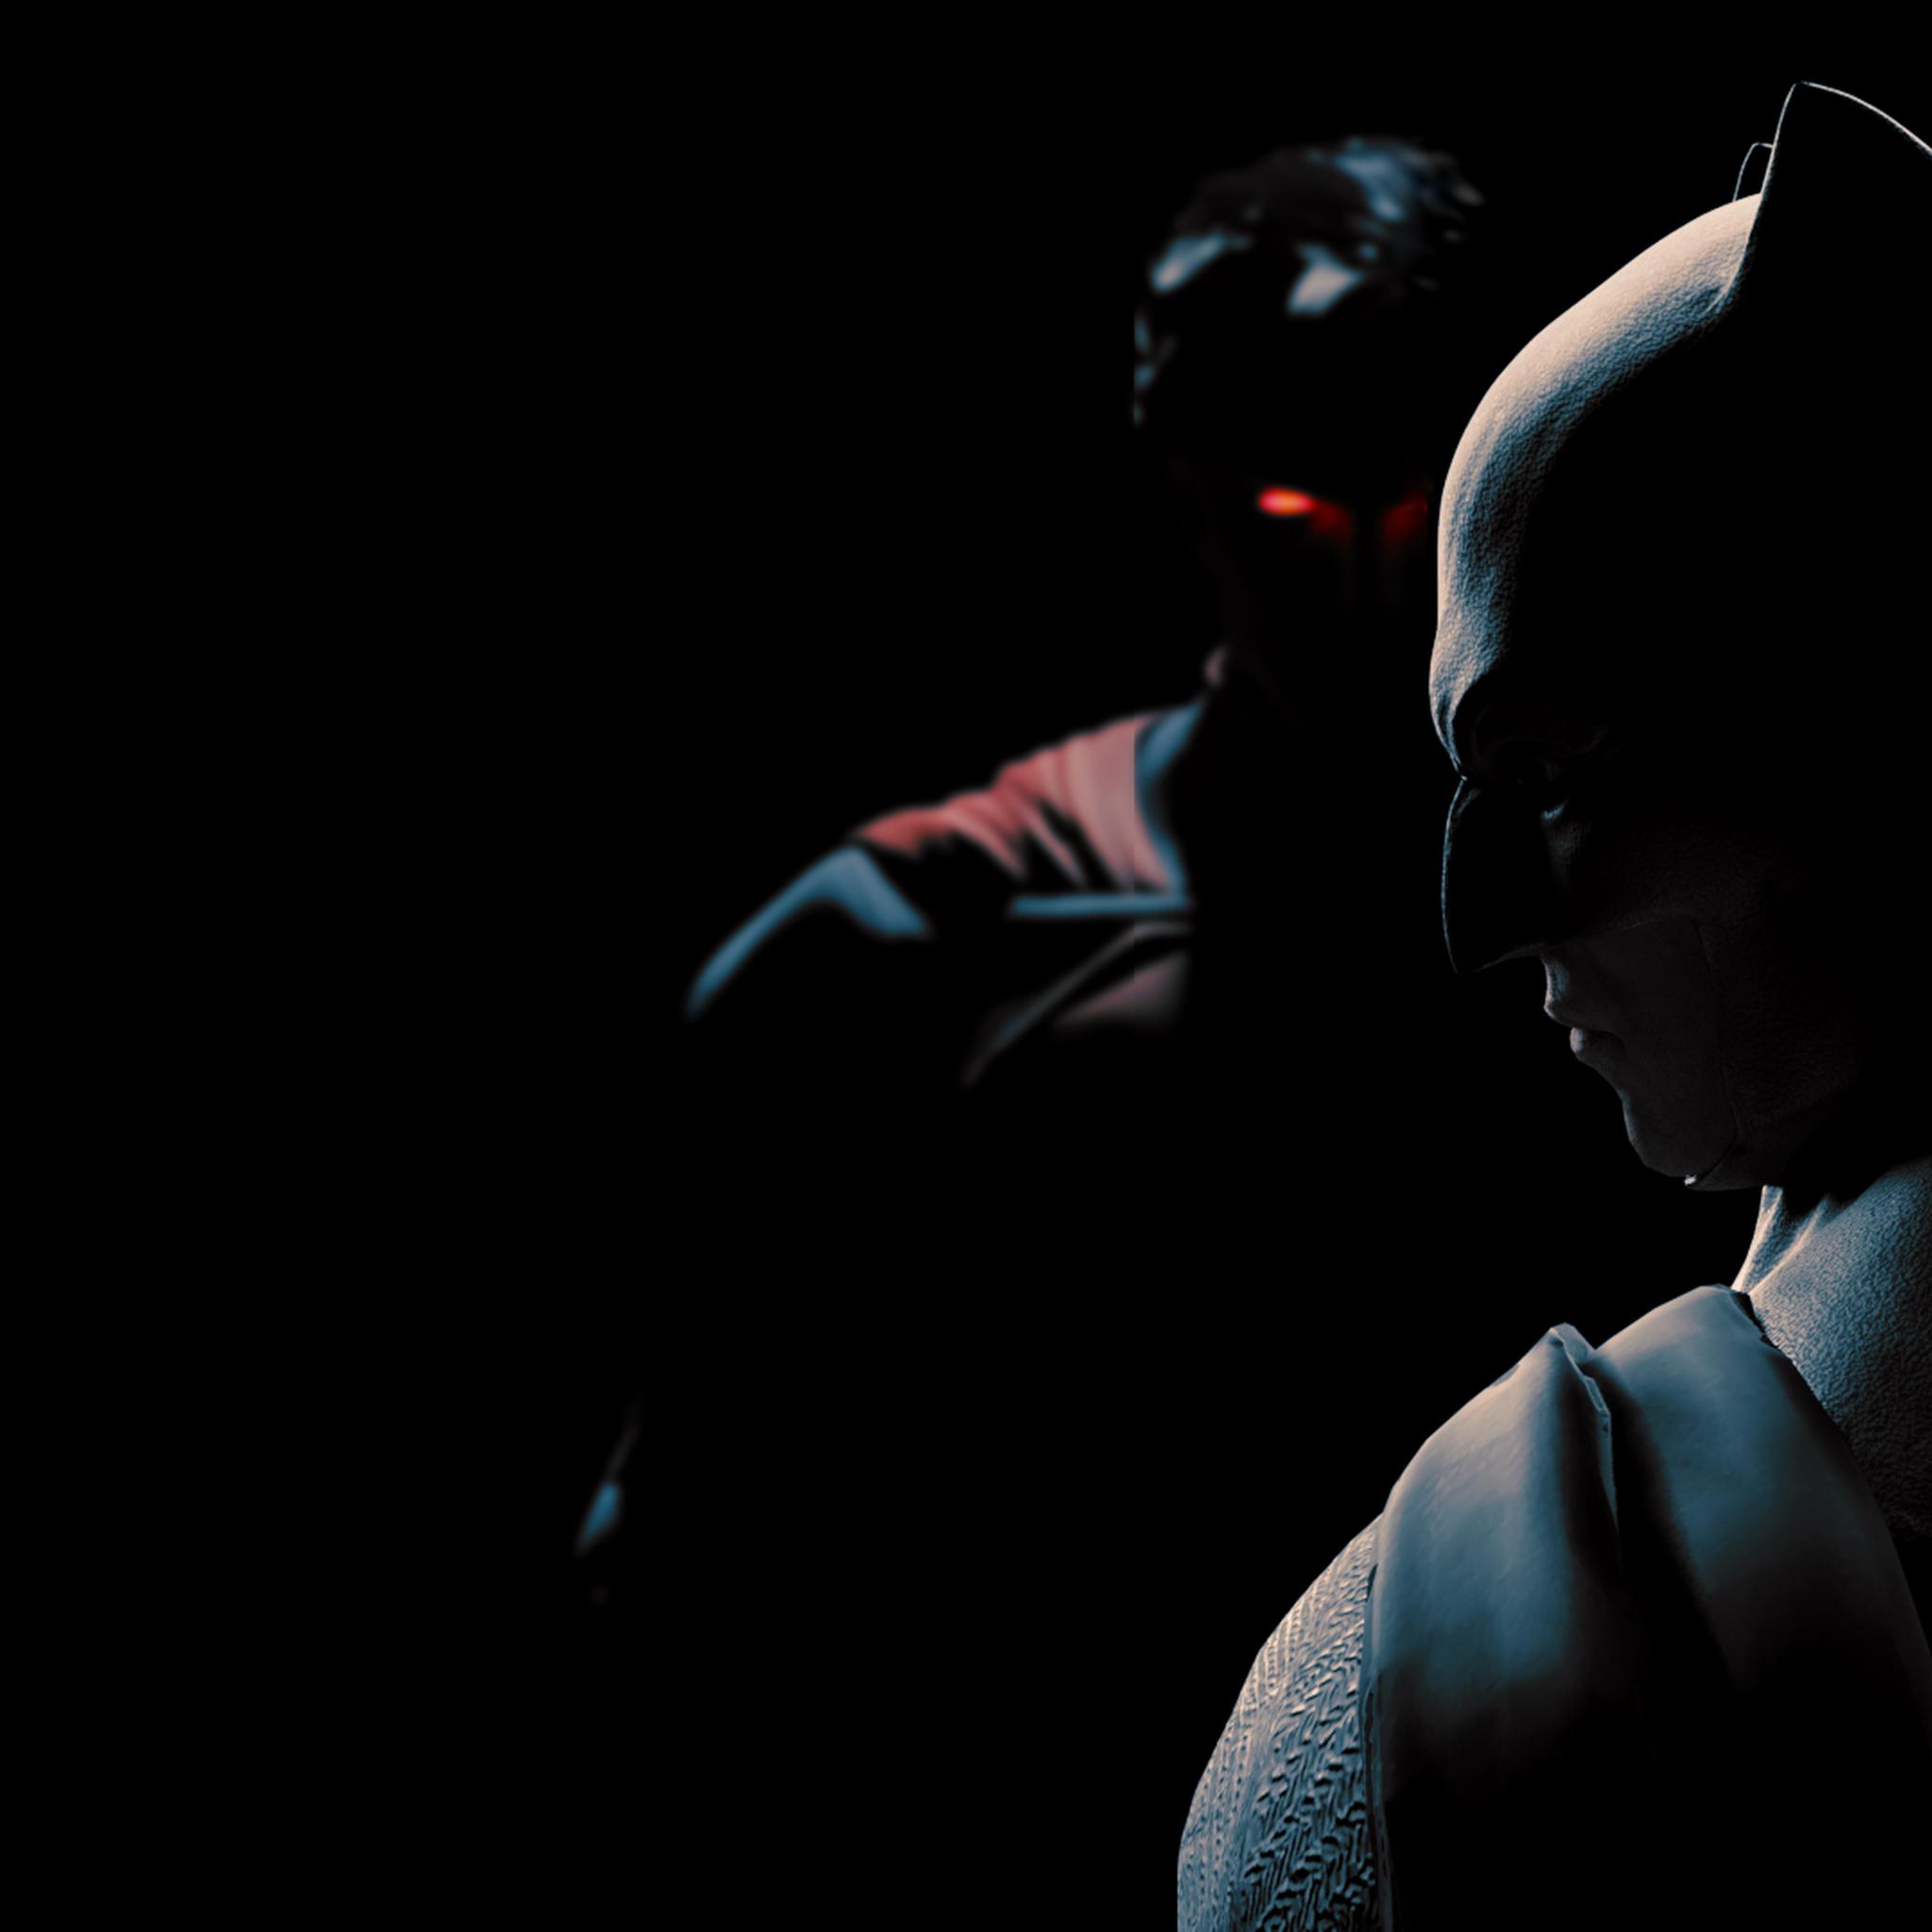 batman-and-superman-4k-to.jpg